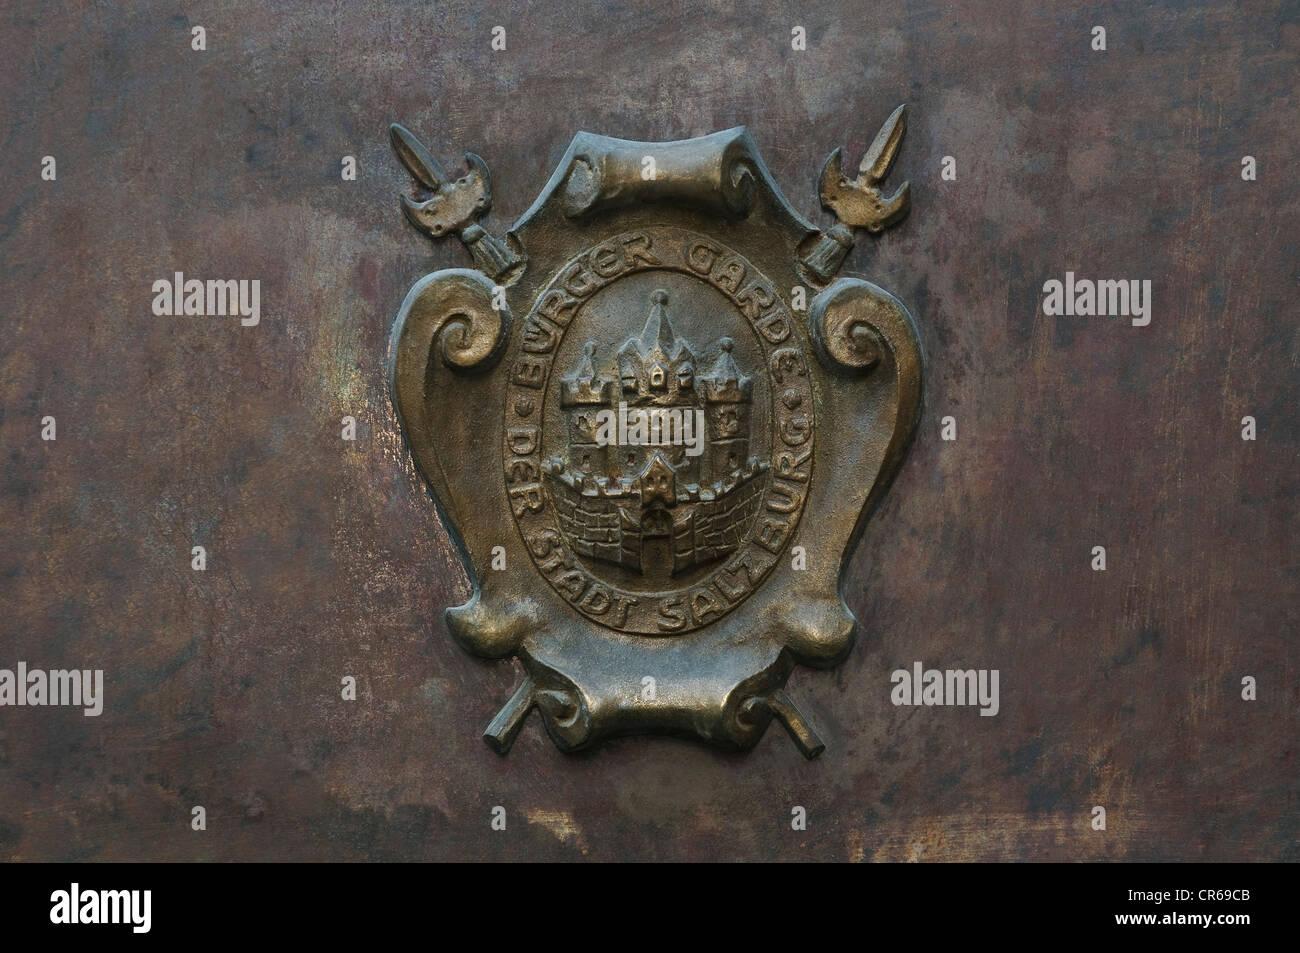 Civil Guard crest of Salzburg, Austria, Europe - Stock Image